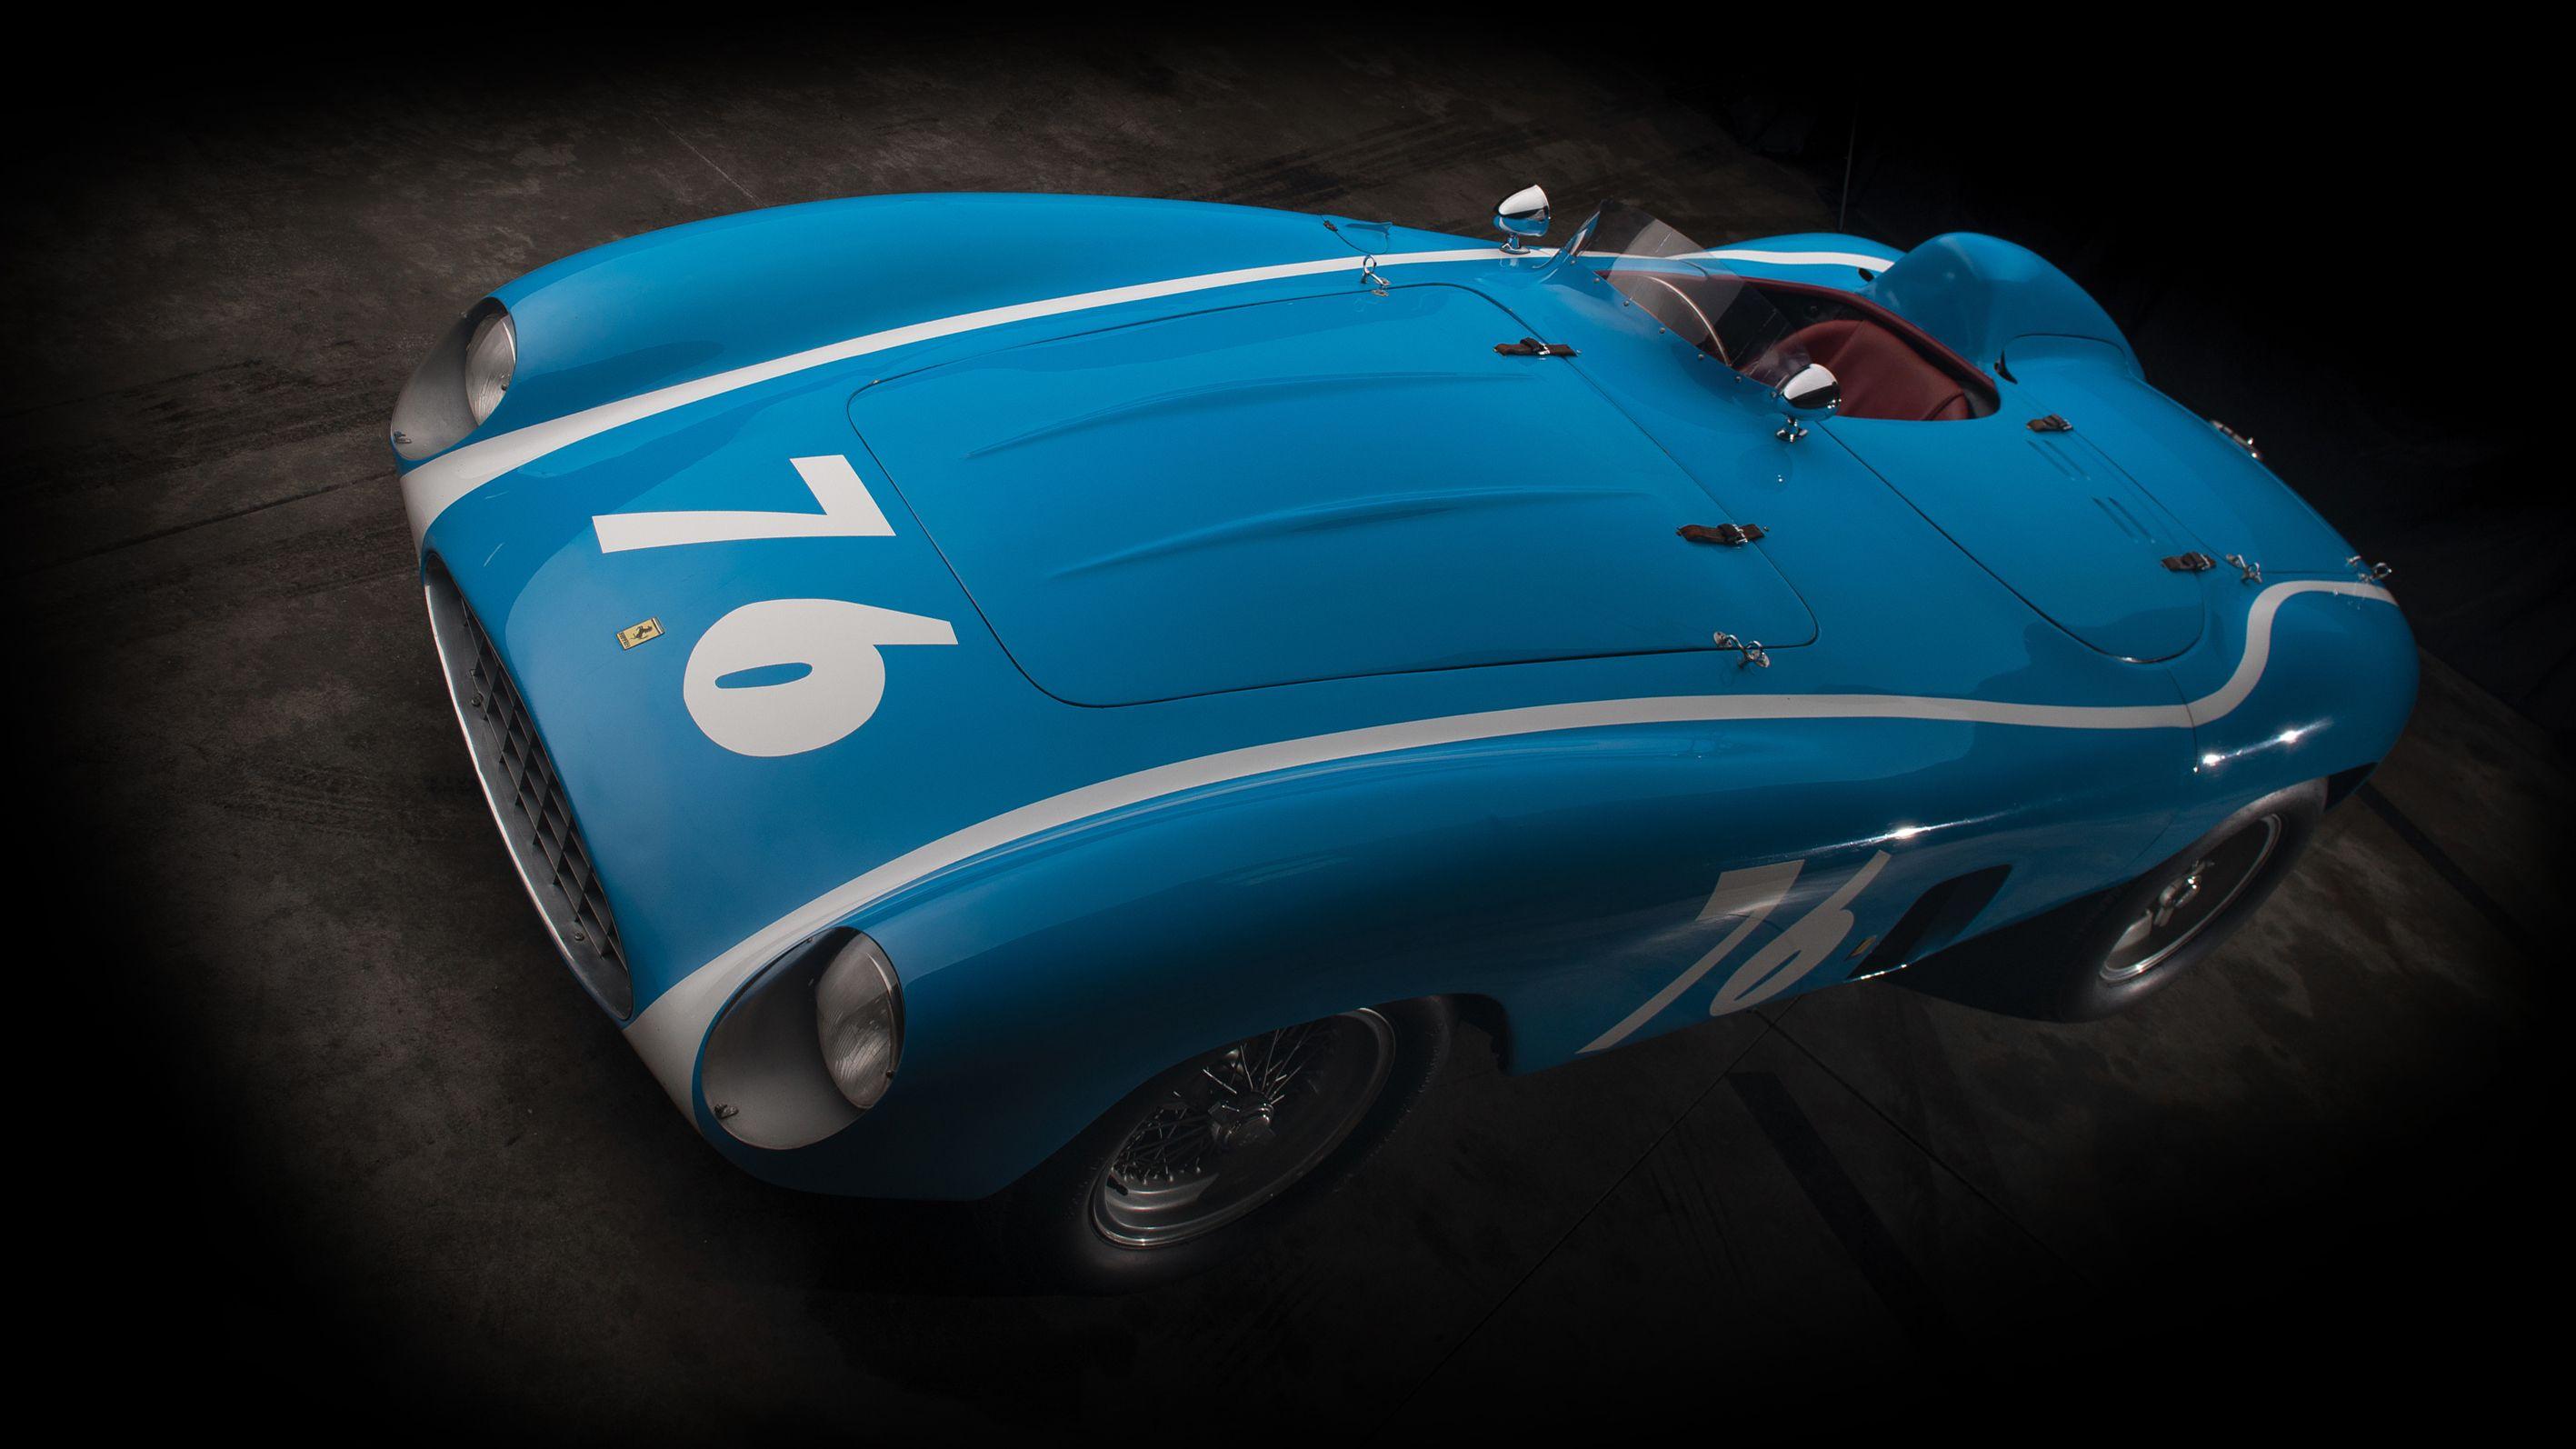 8a6821aa648a42b639c48b68fe2c1102 Terrific Ferrari Mondial Cabrio In Vendita Cars Trend